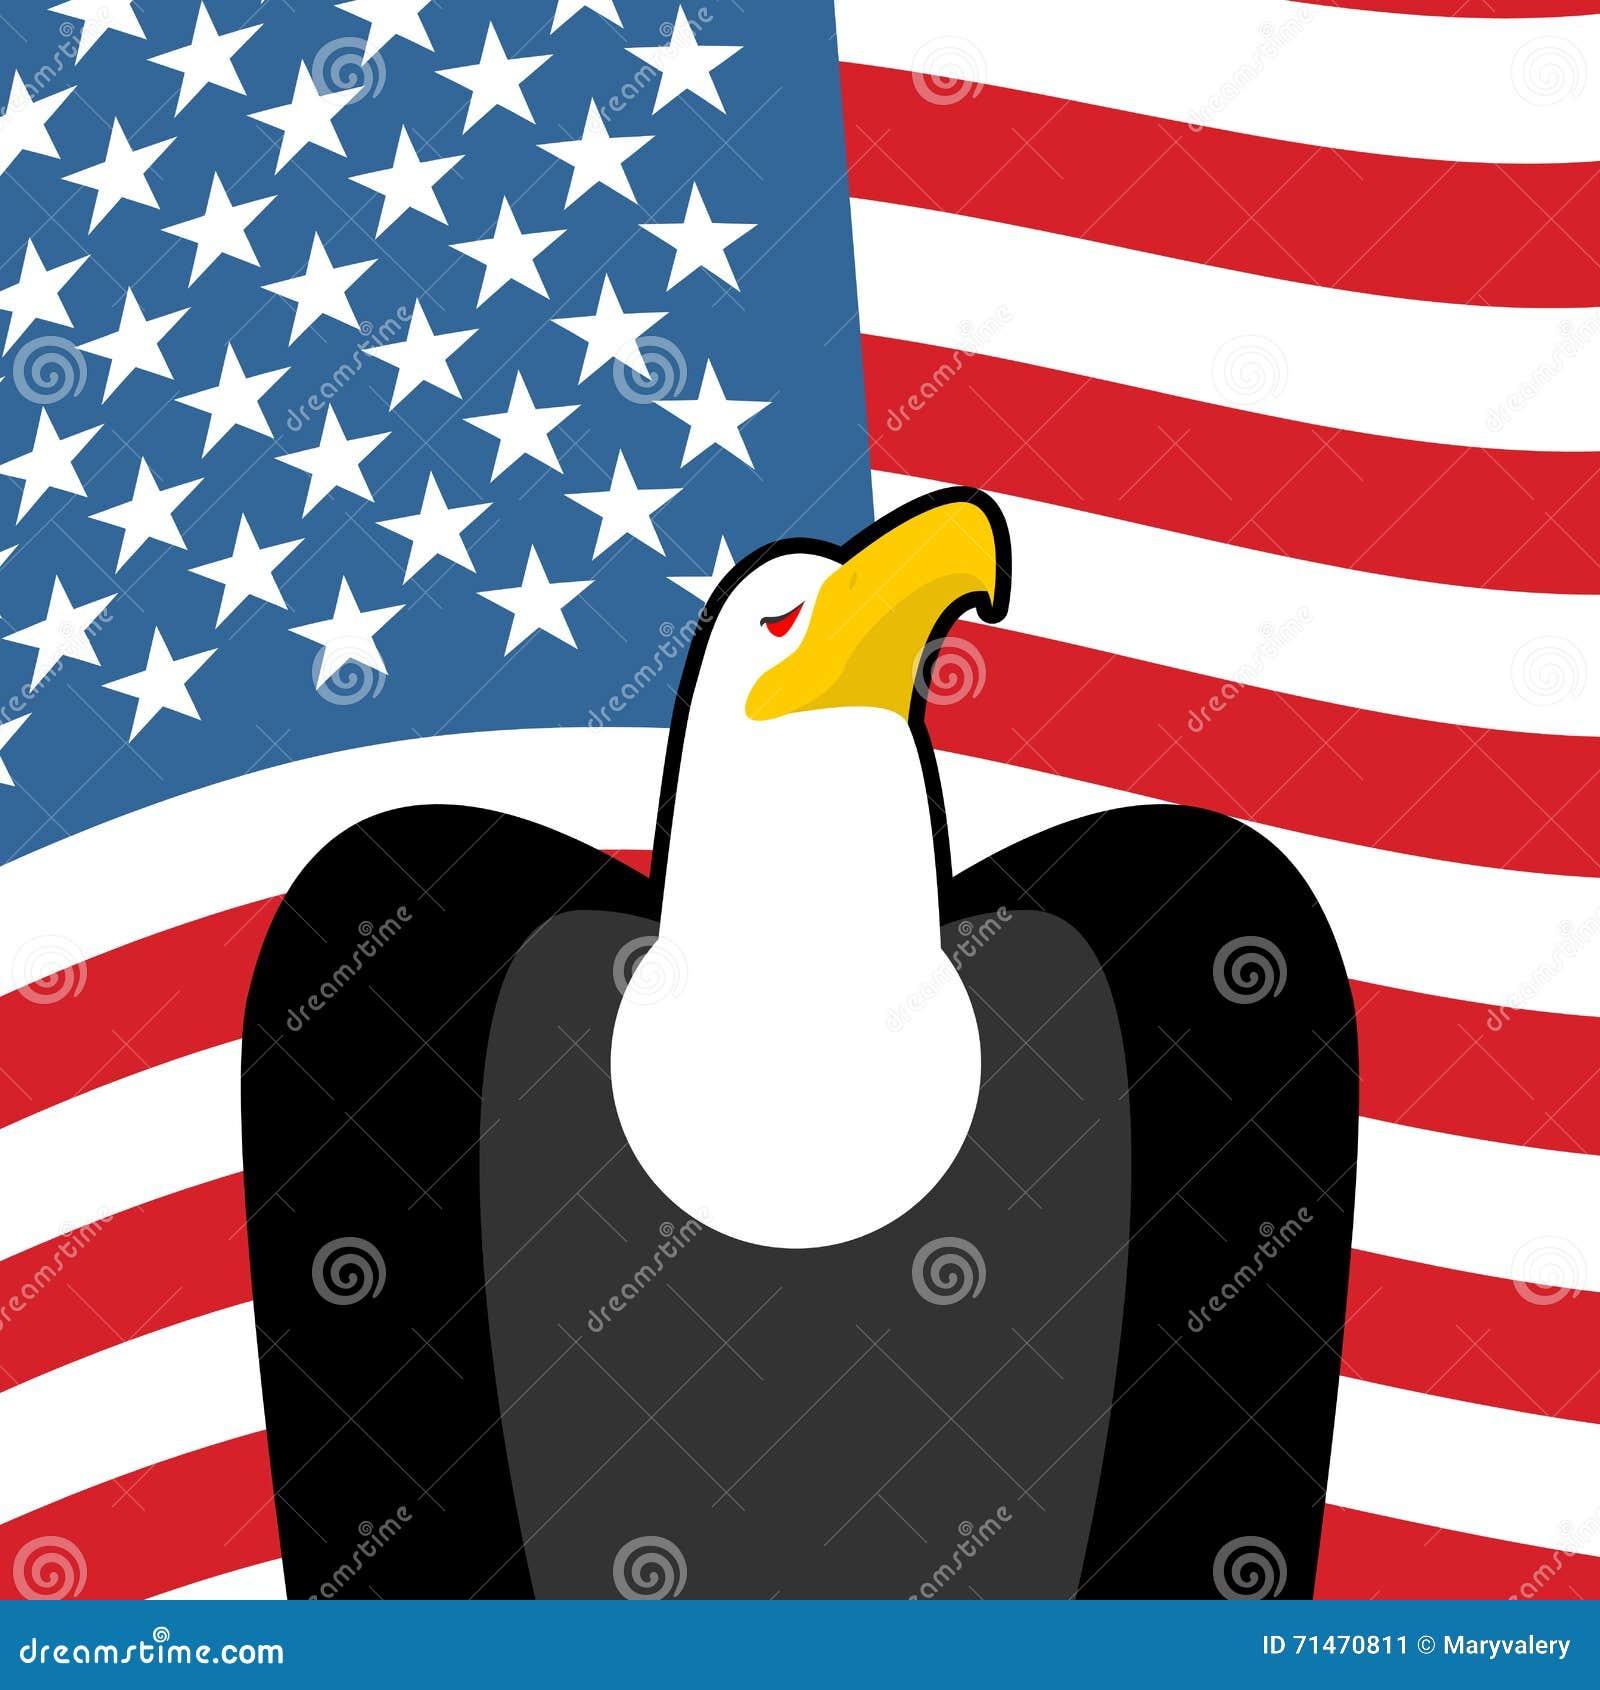 Bald Eagle Usa National Symbols Large Birds Of Prey And Flag Stock